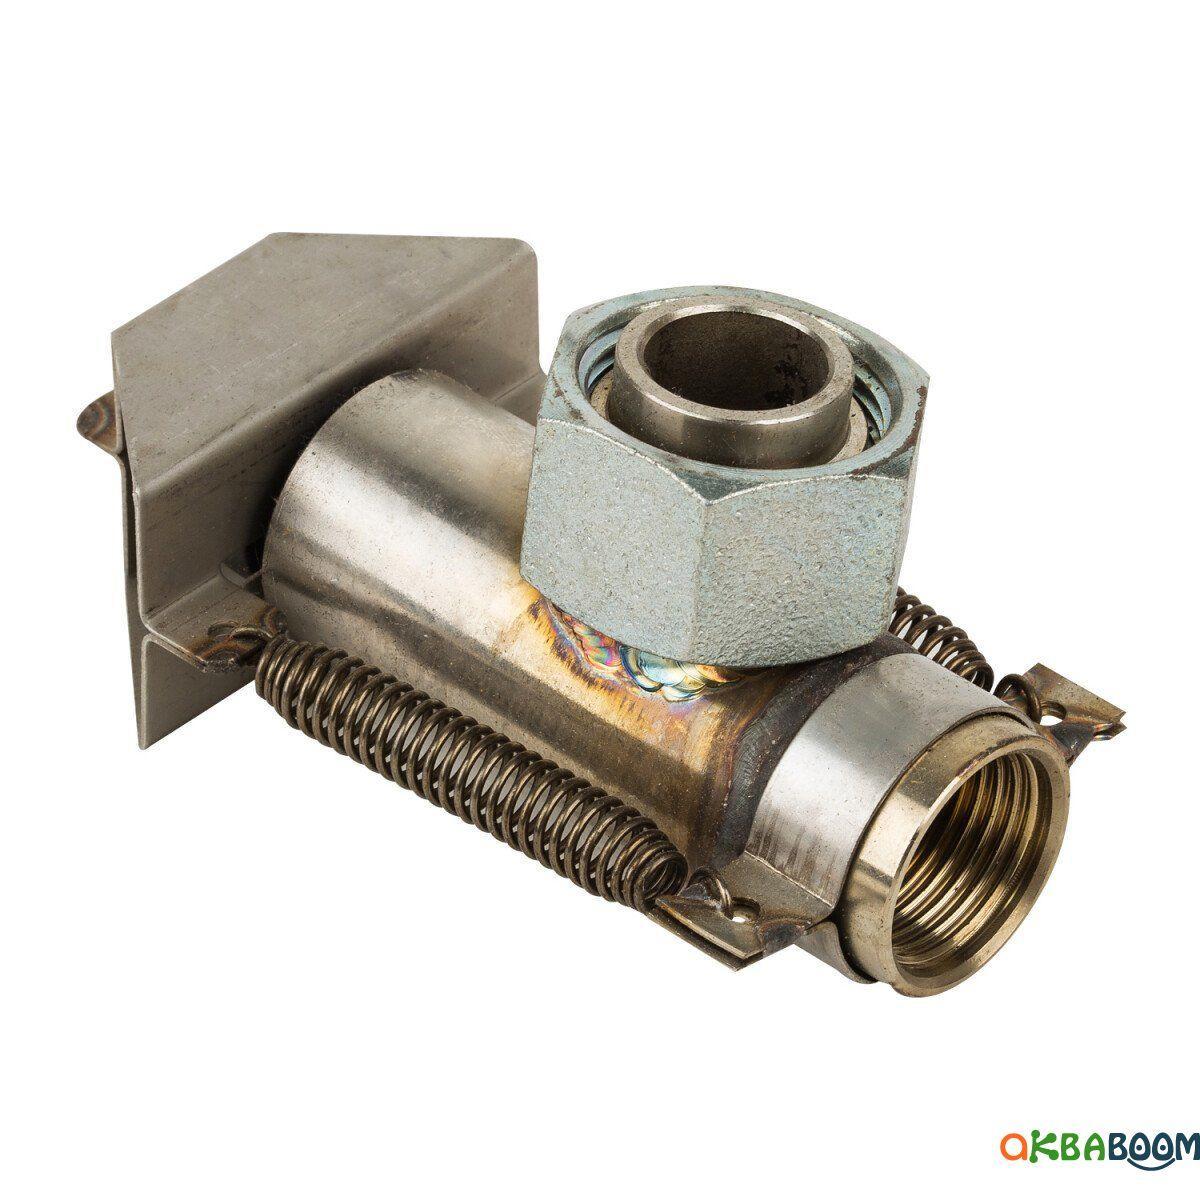 Сливной клапан для парогенератора 4 вар., Клапан, Китай, Клапан